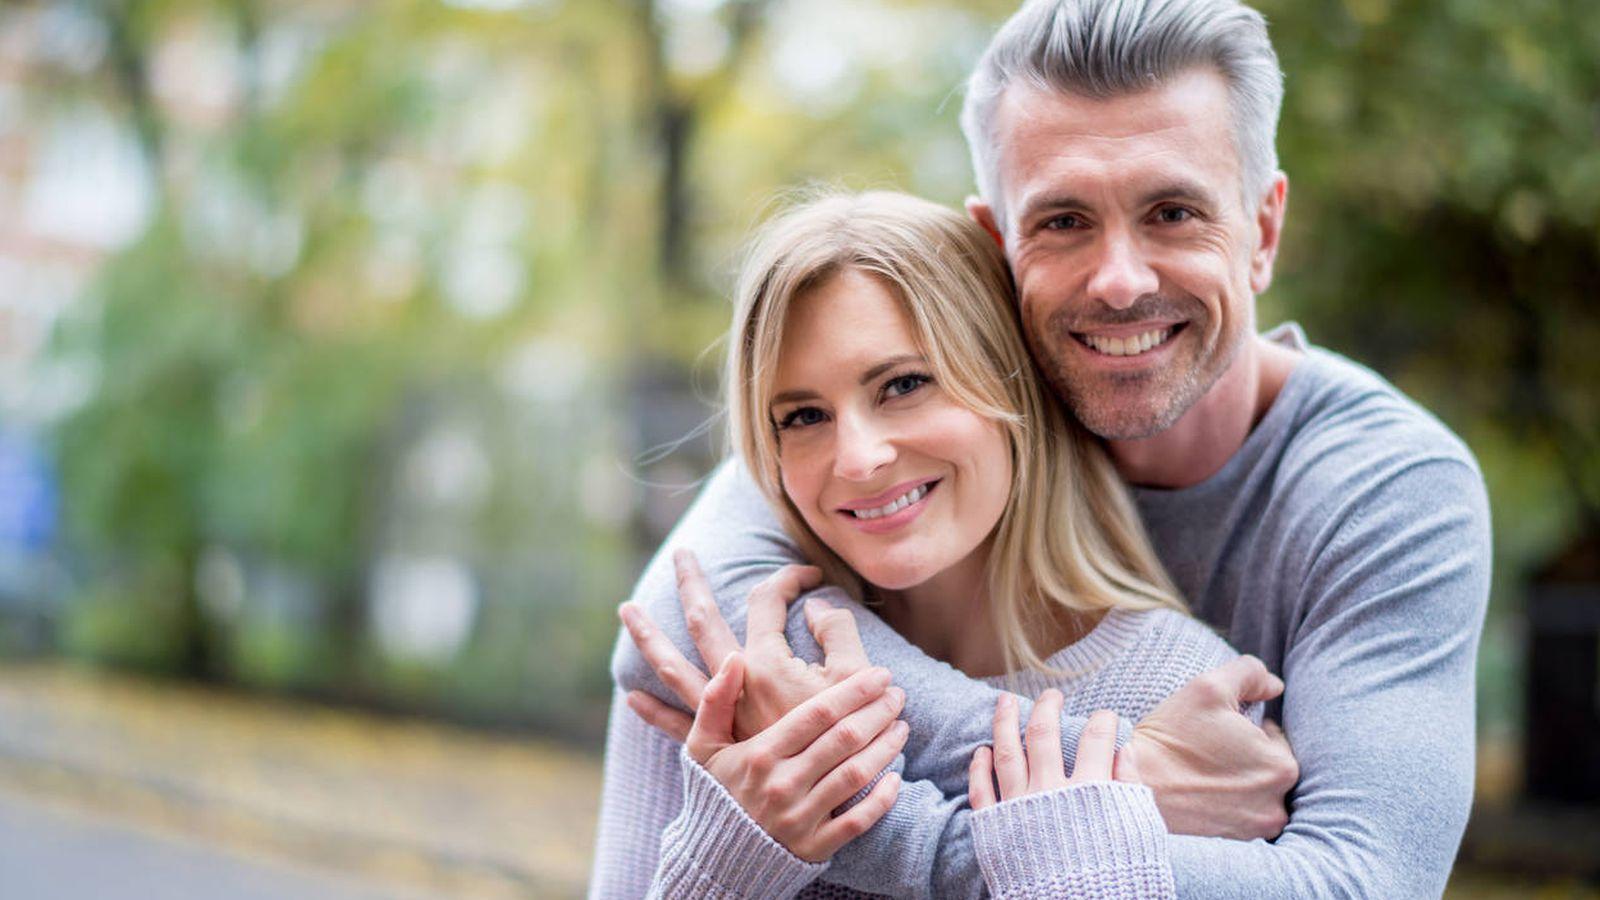 Encontrar pareja joven activa sexualmente [PUNIQRANDLINE-(au-dating-names.txt) 52